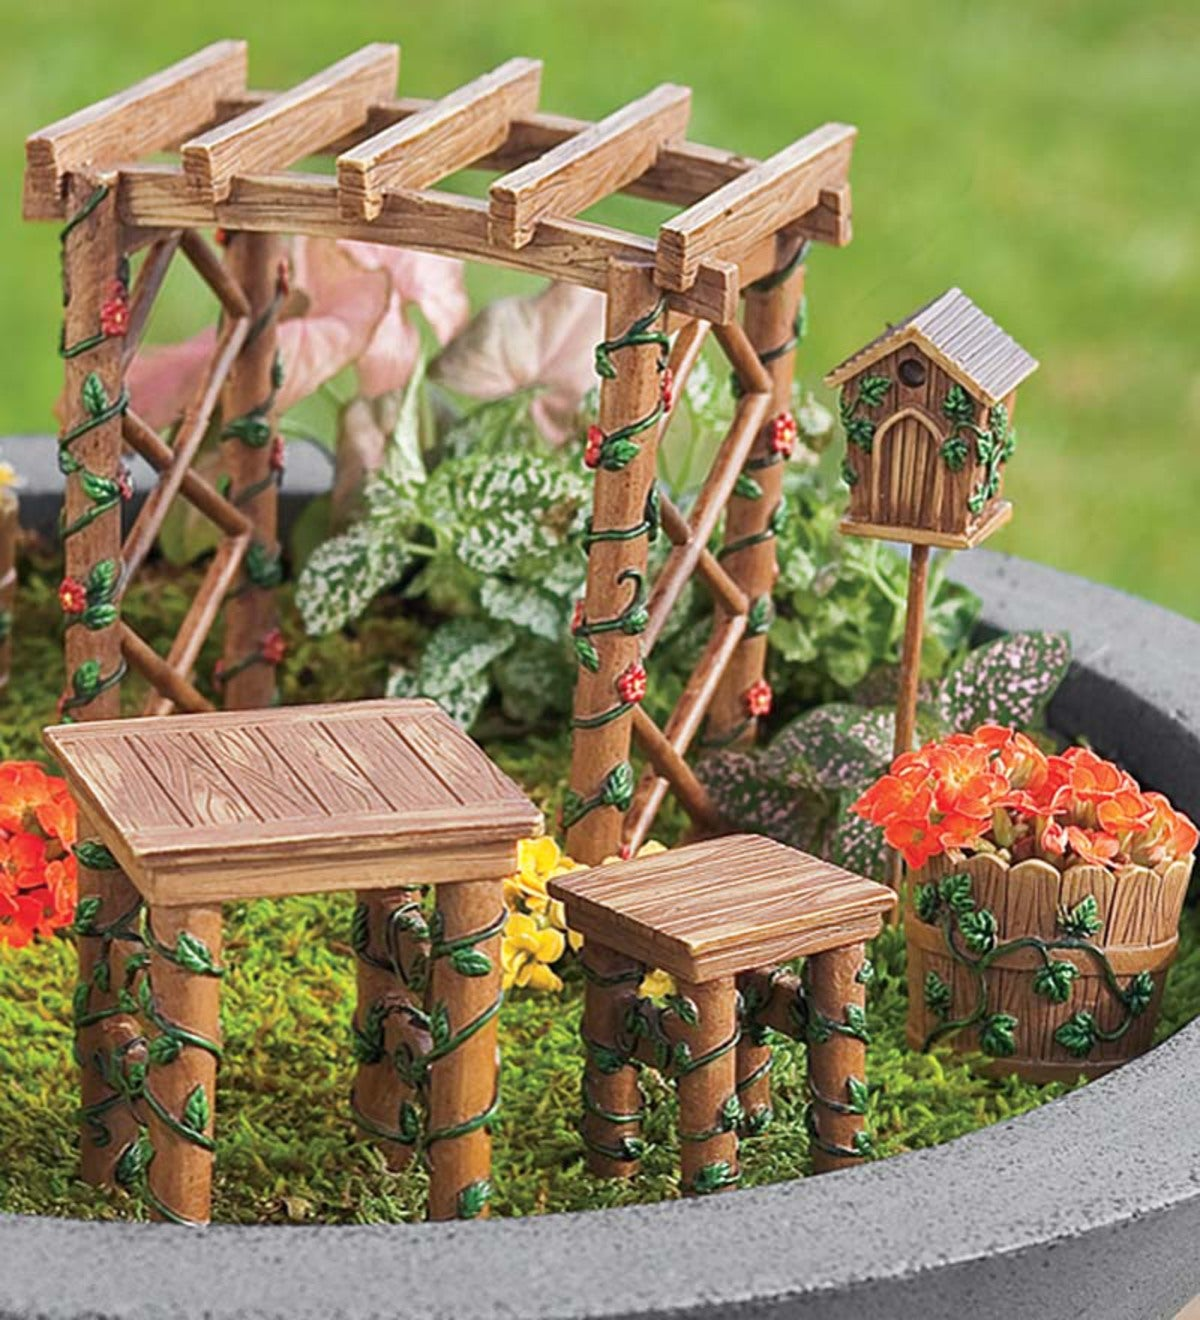 Wooden Fairy Garden Picket Stake Plaque Sign